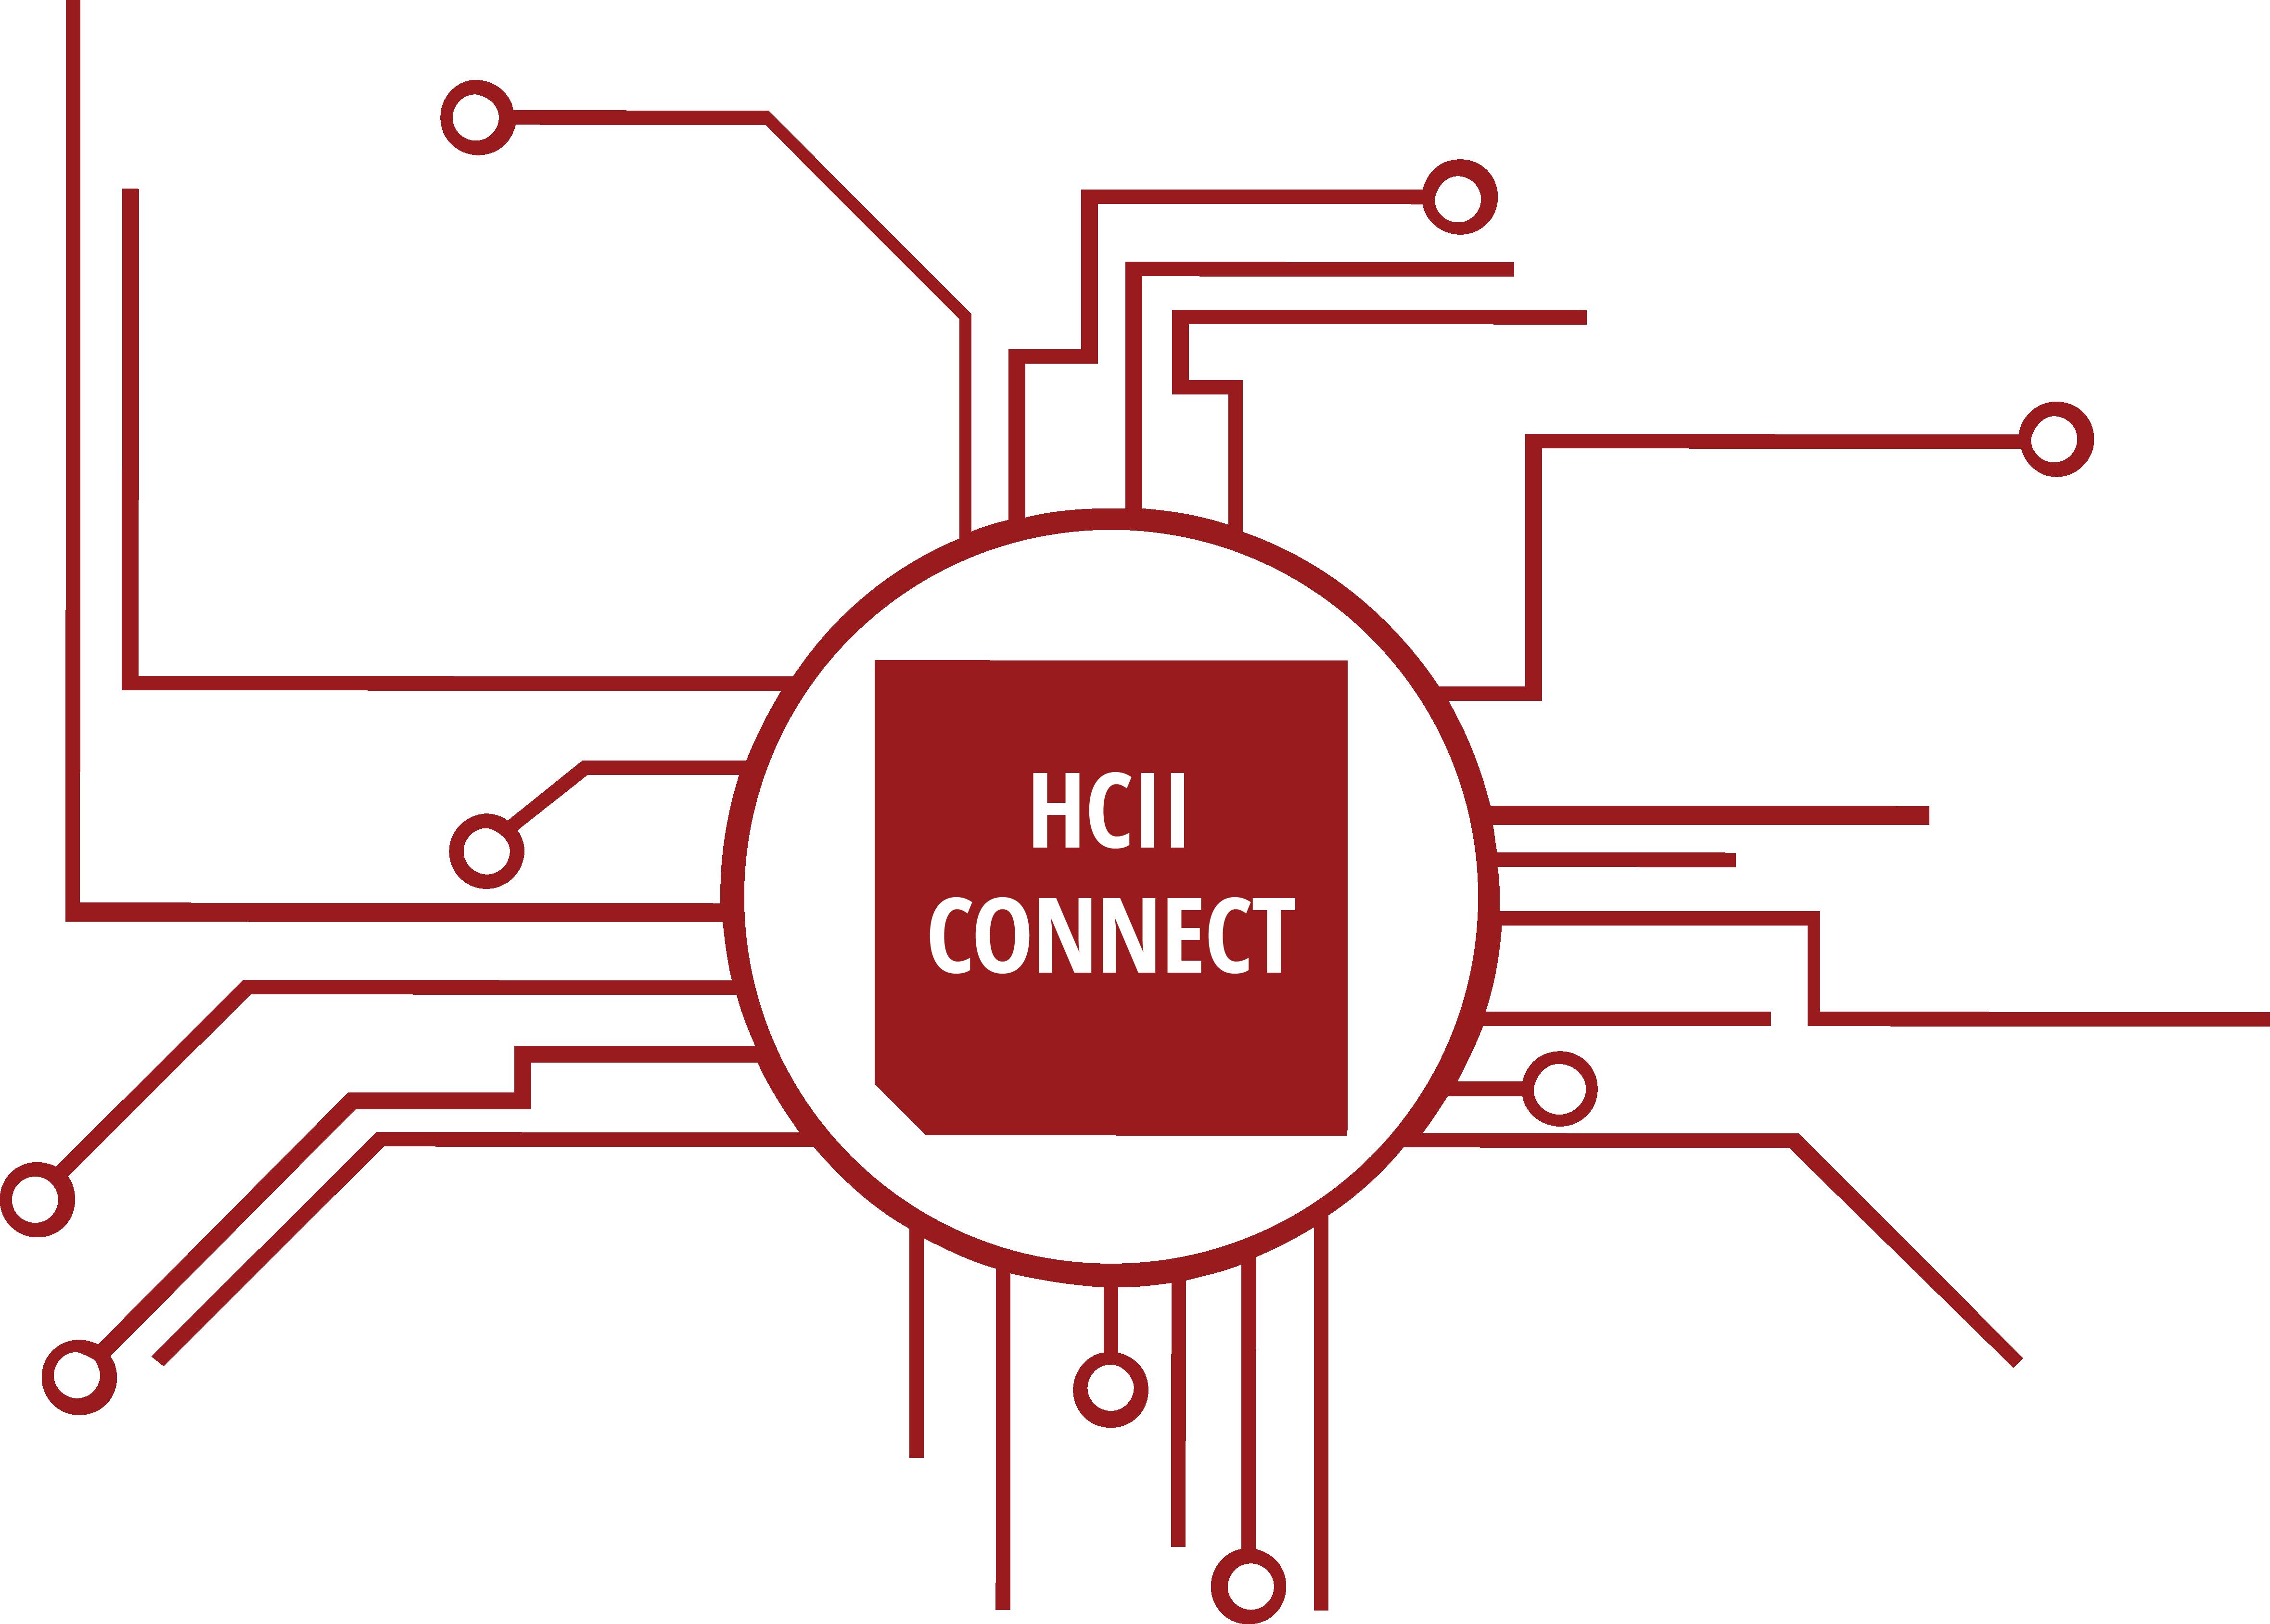 HCII Connect 2017